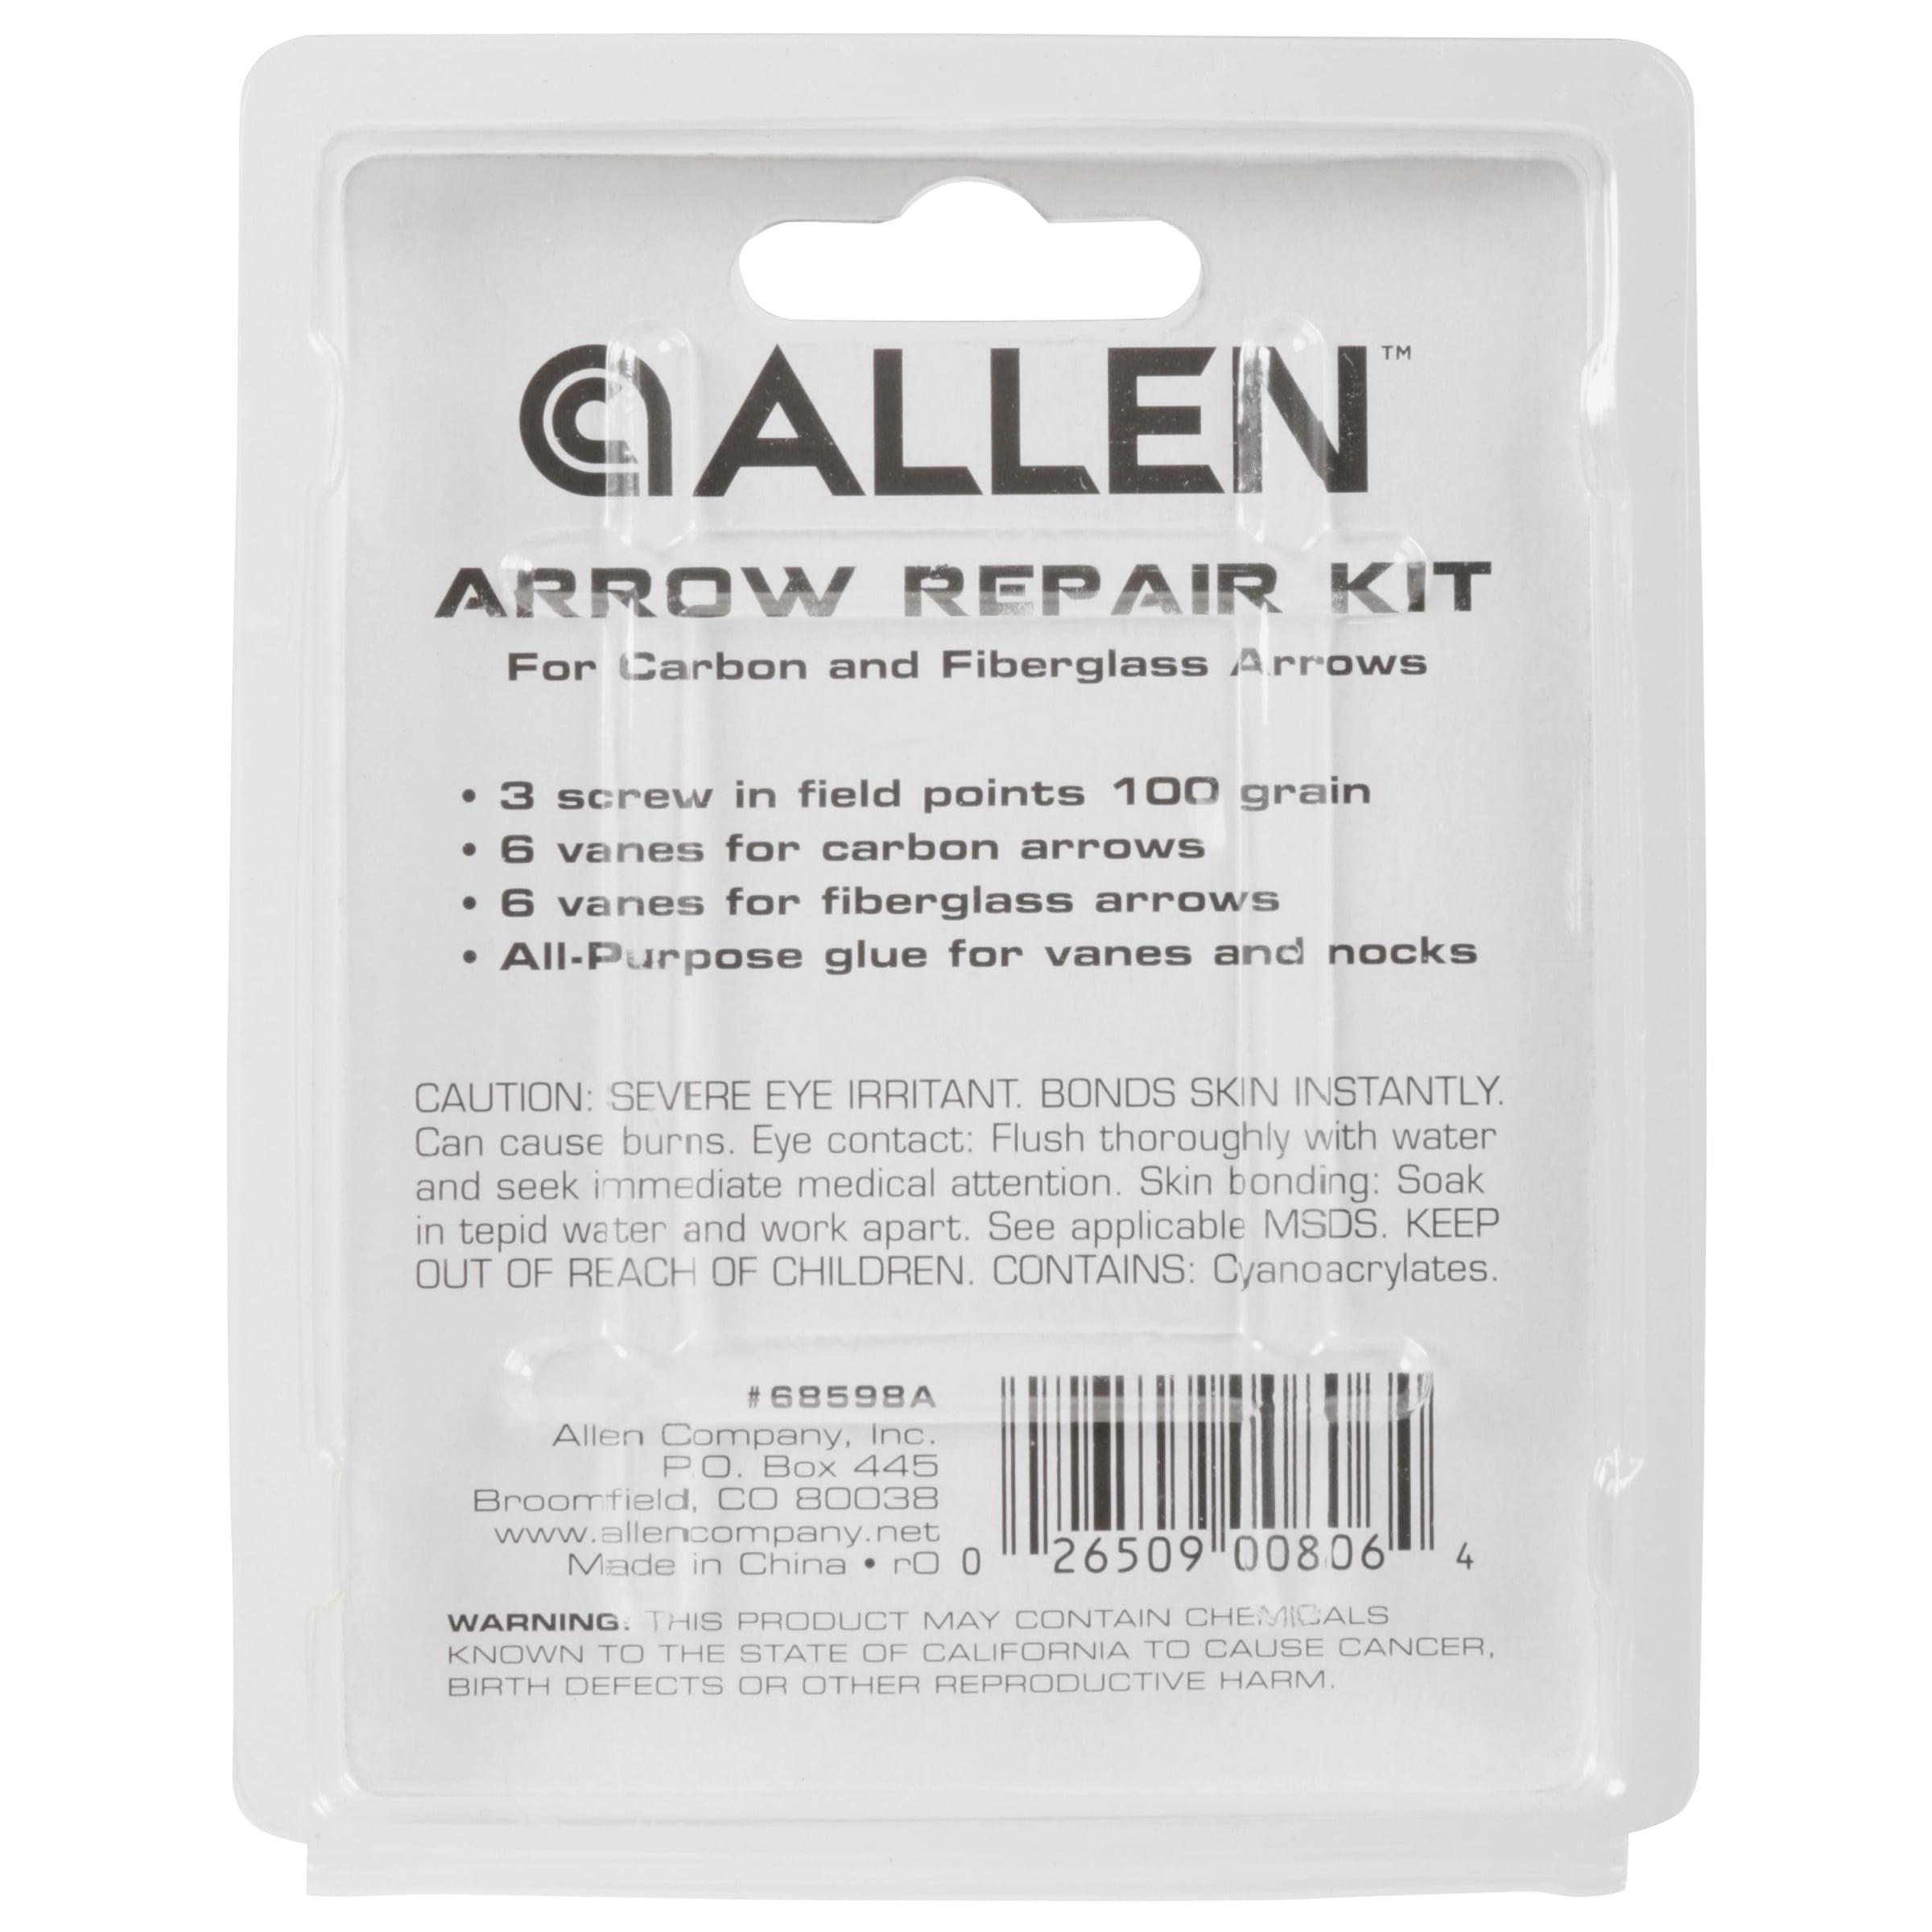 Allen Arrow Repair Kit For Carbon or Fiberglass Arrows